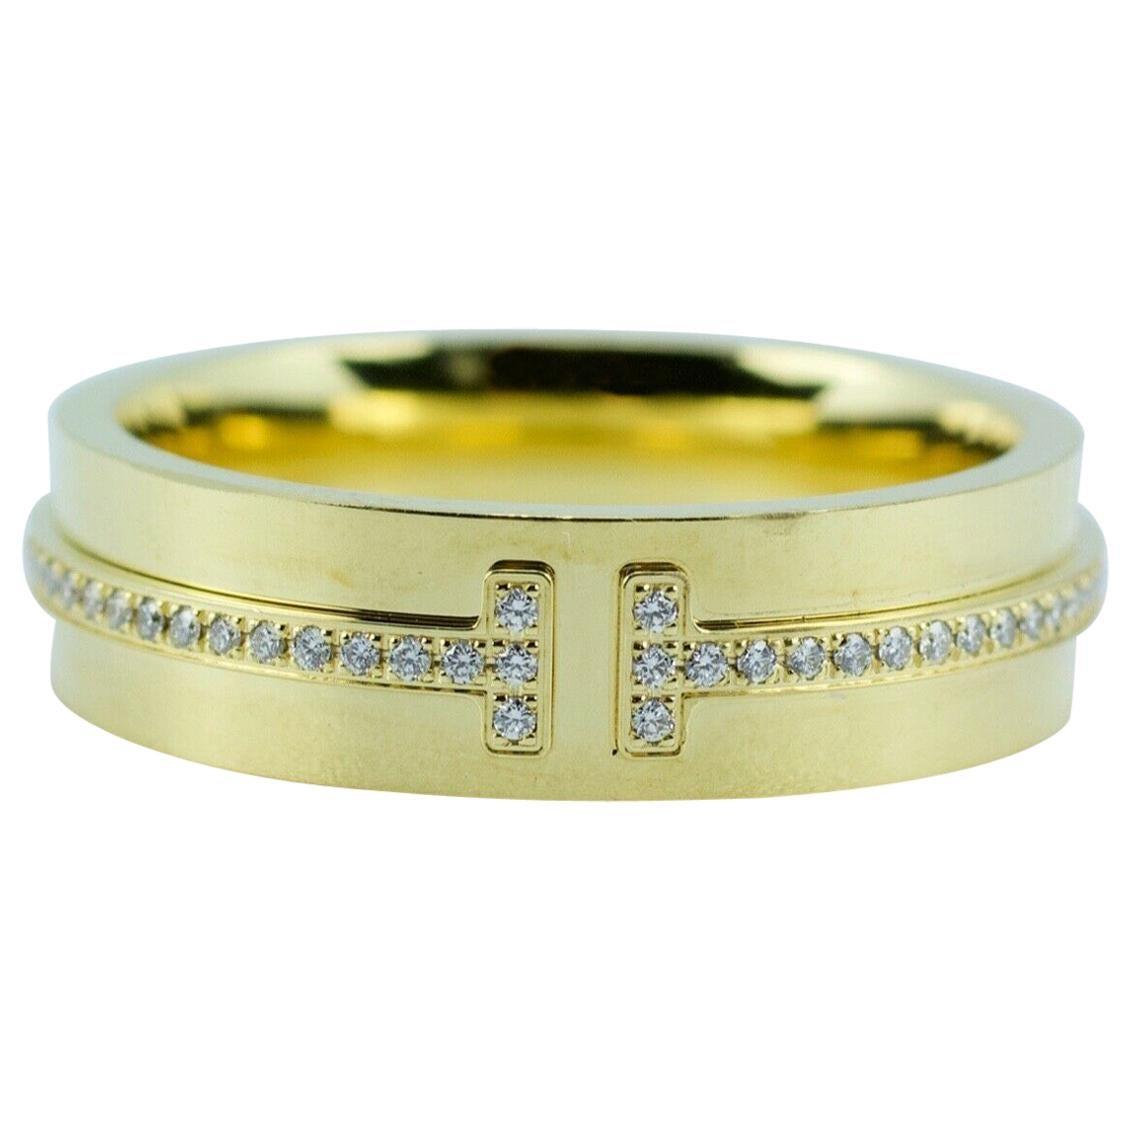 Tiffany & Co. Tiffany T-Wide Diamond Ring 18 Karat Yellow Gold